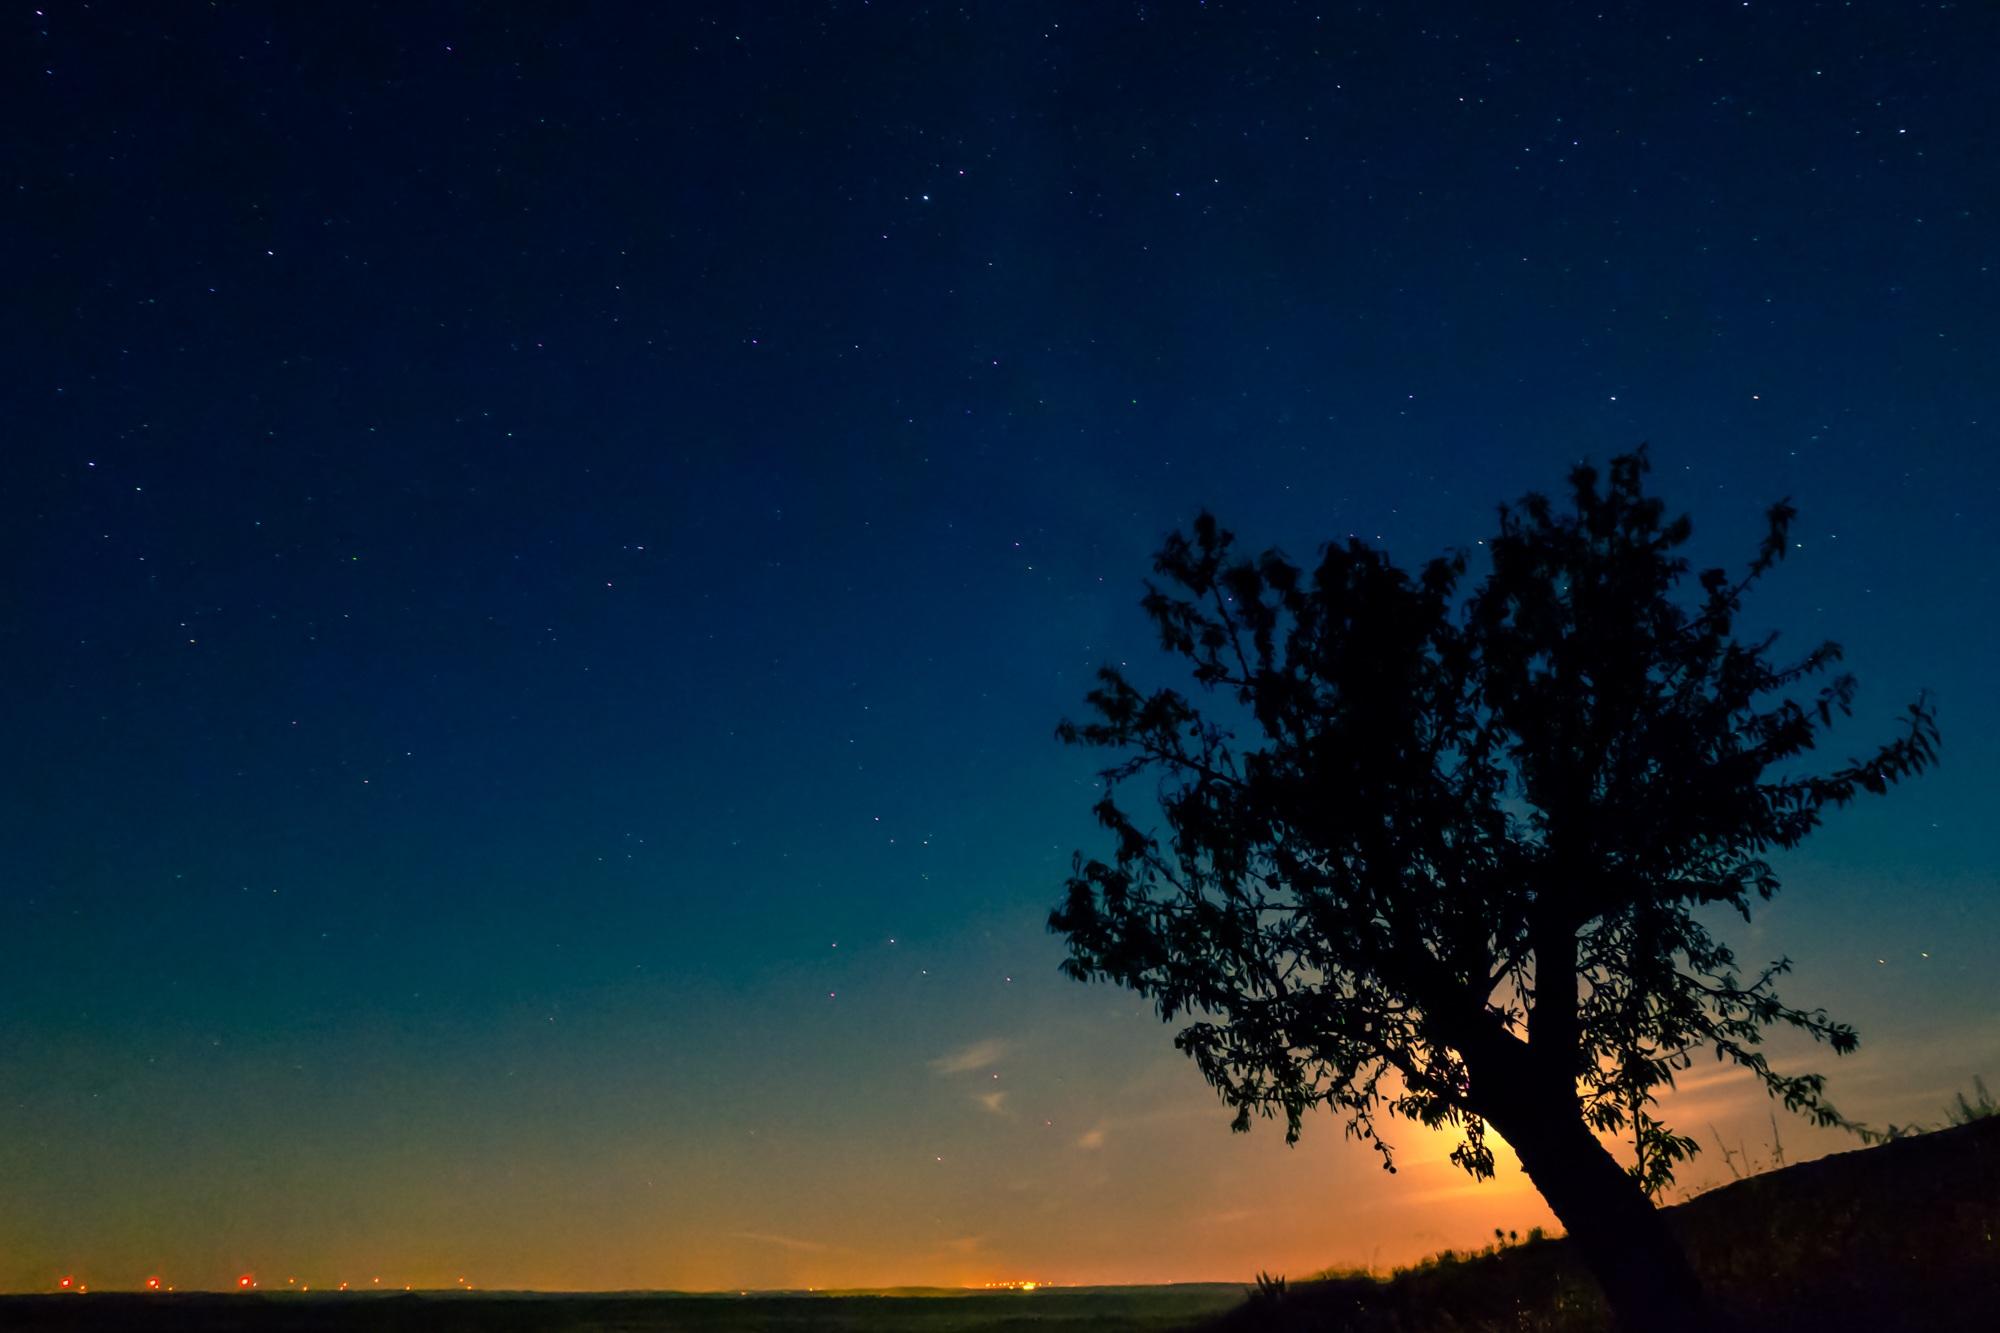 83 Gambar Pemandangan Langit Malam Paling Bagus